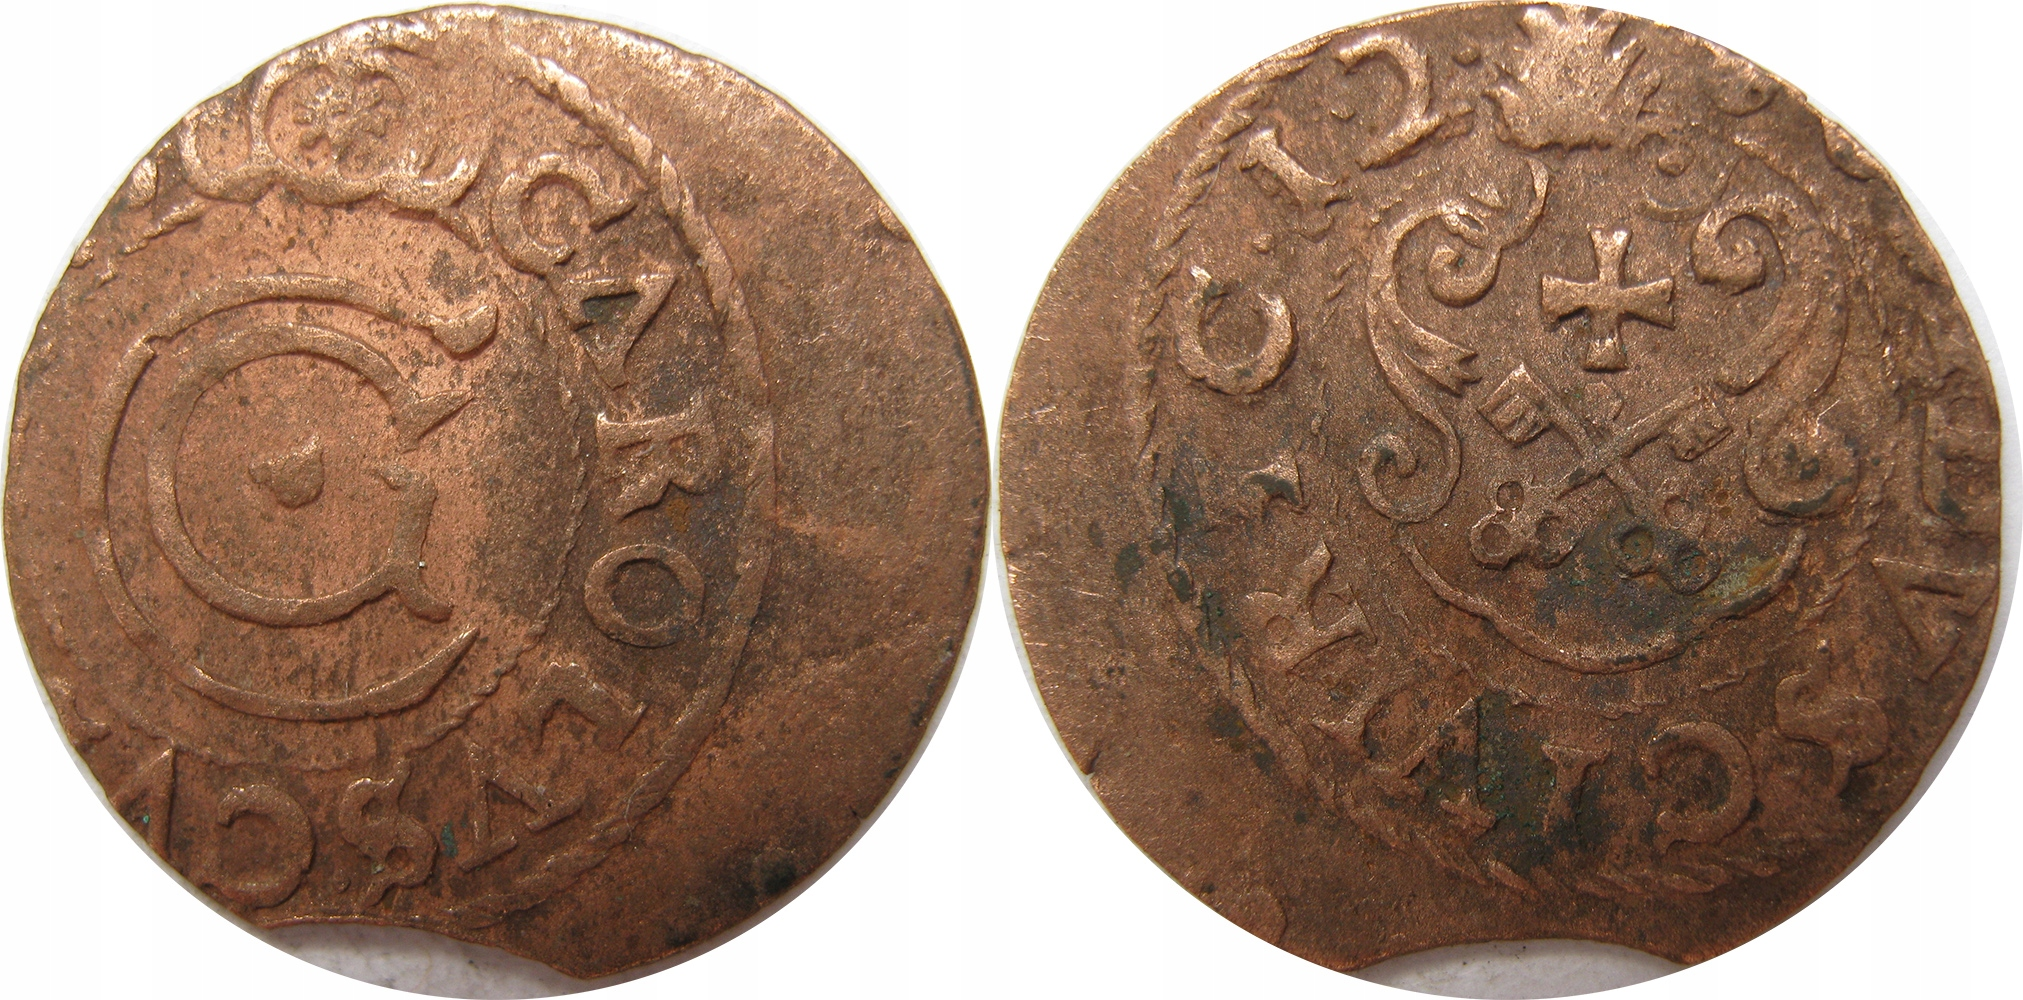 Szelag Karola Gustawa, fals z epoki data 12